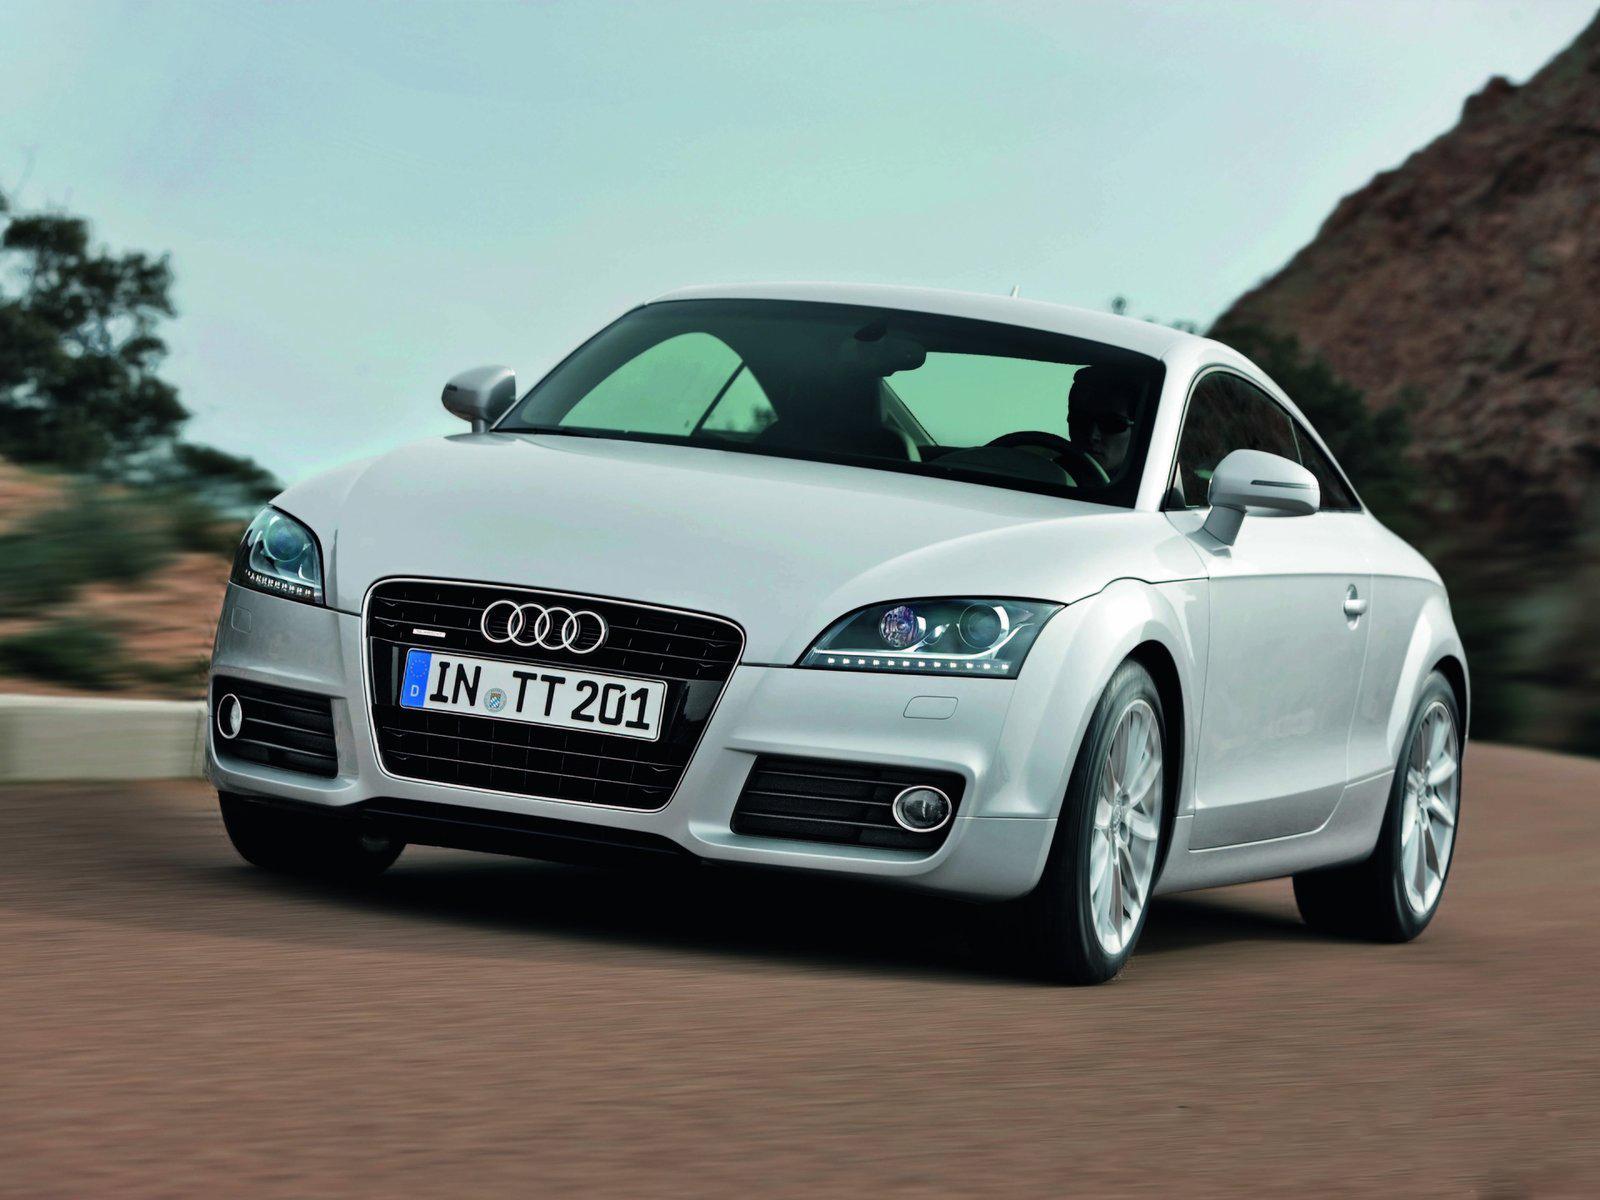 Audi tt coupe owner manual ebook pdf audi tt service manual array automotive database audi tt rh autocarbase com fandeluxe Images